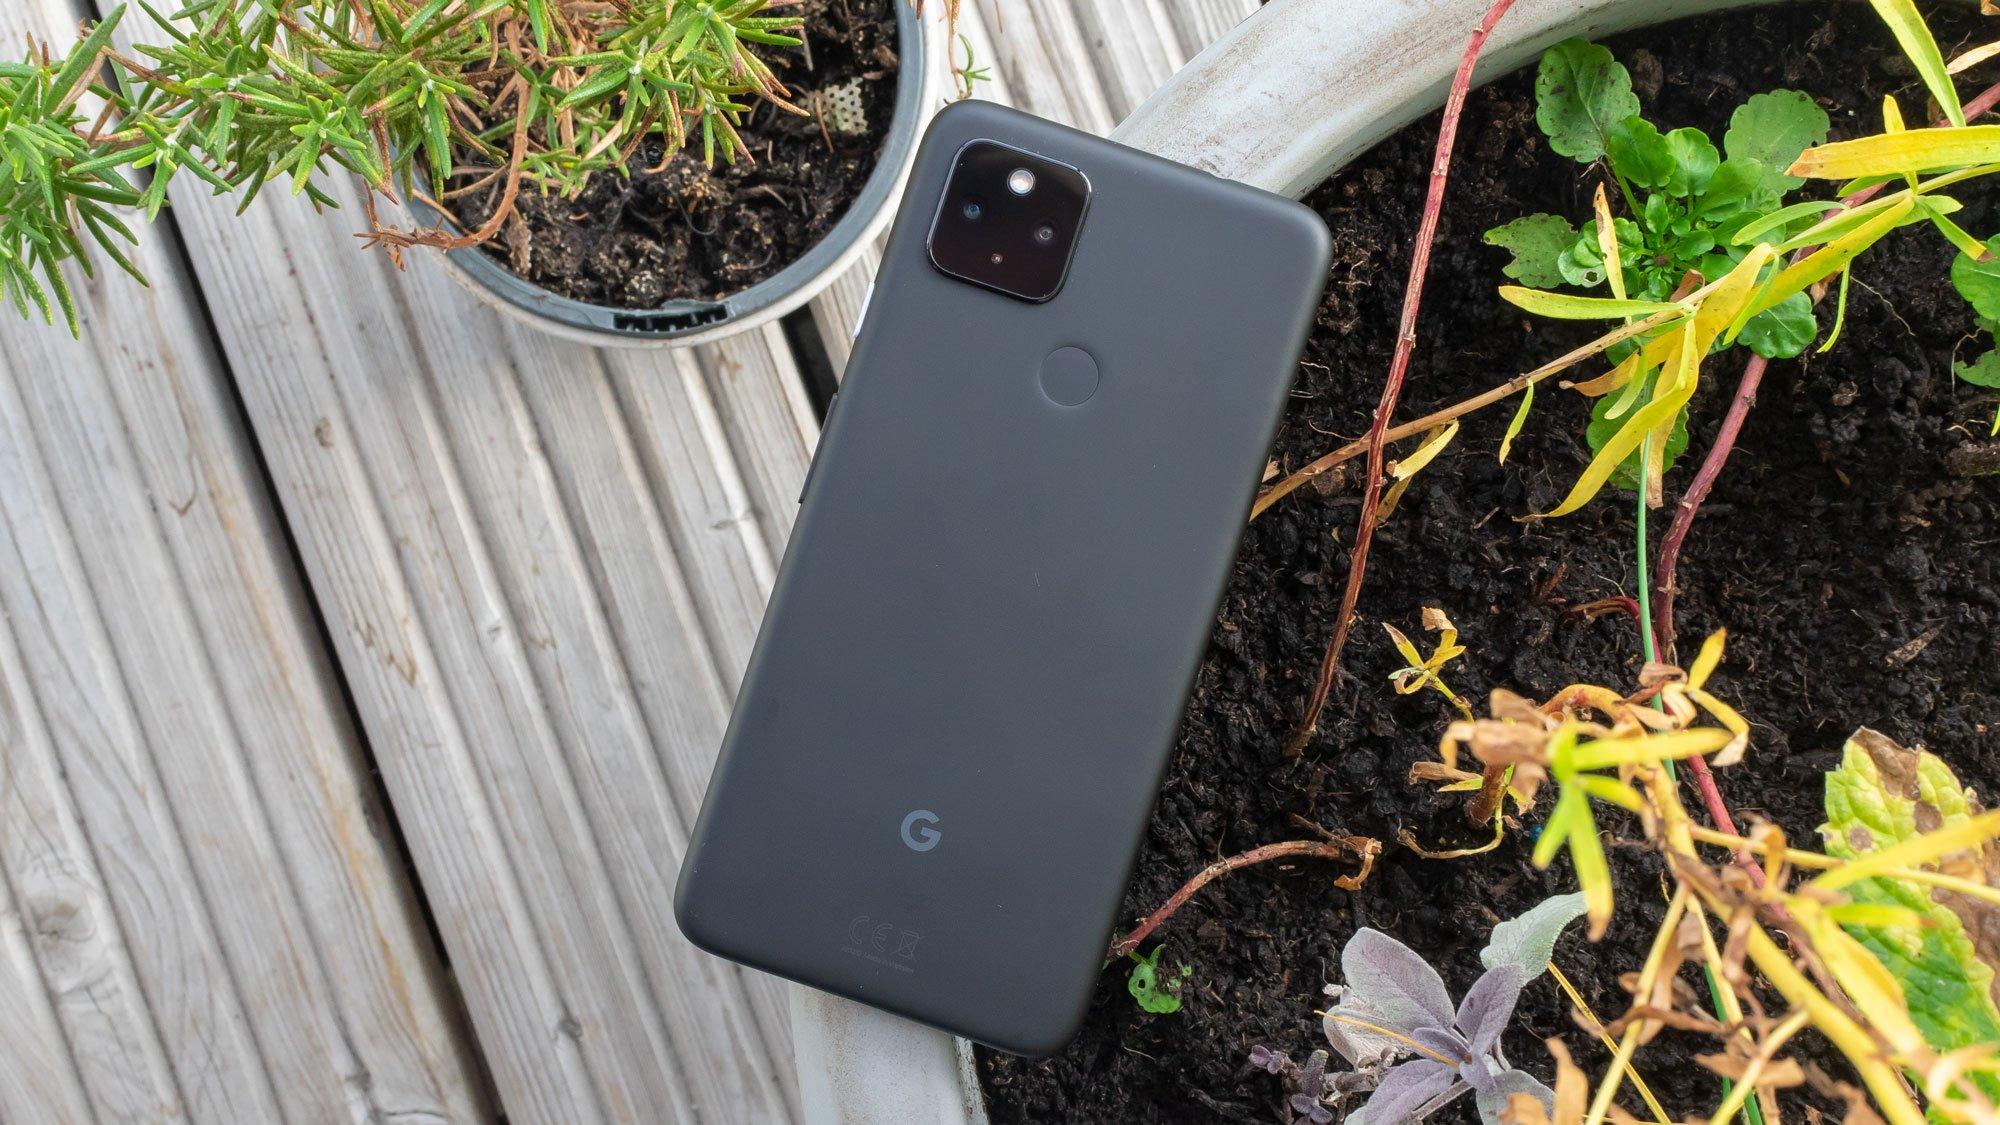 https://www.expertreviews.co.uk/google/1412598/google-pixel-4a-5g-review